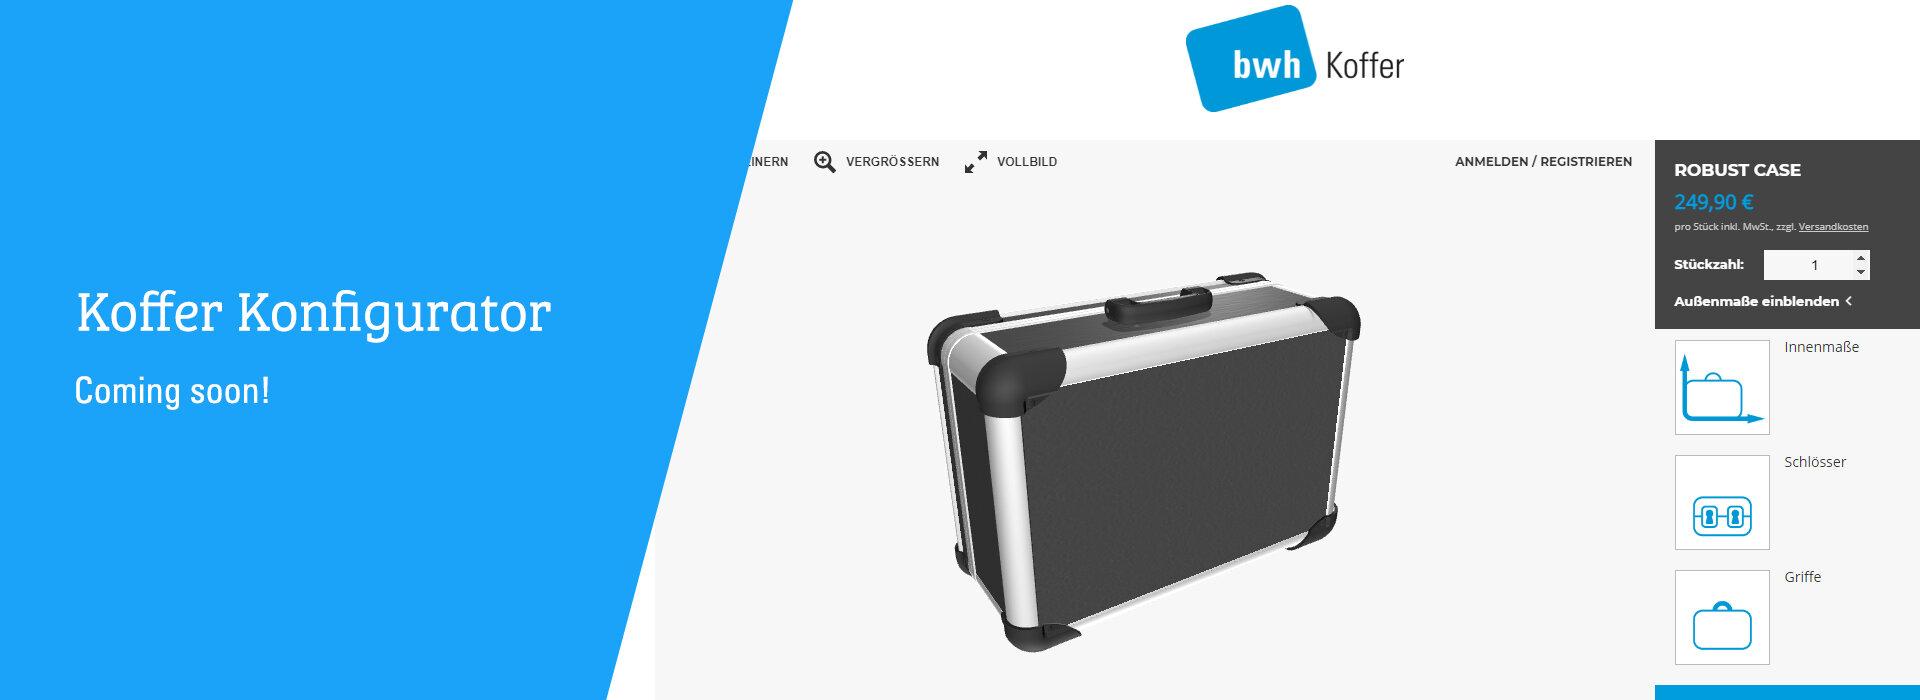 Koffer Konfigurator